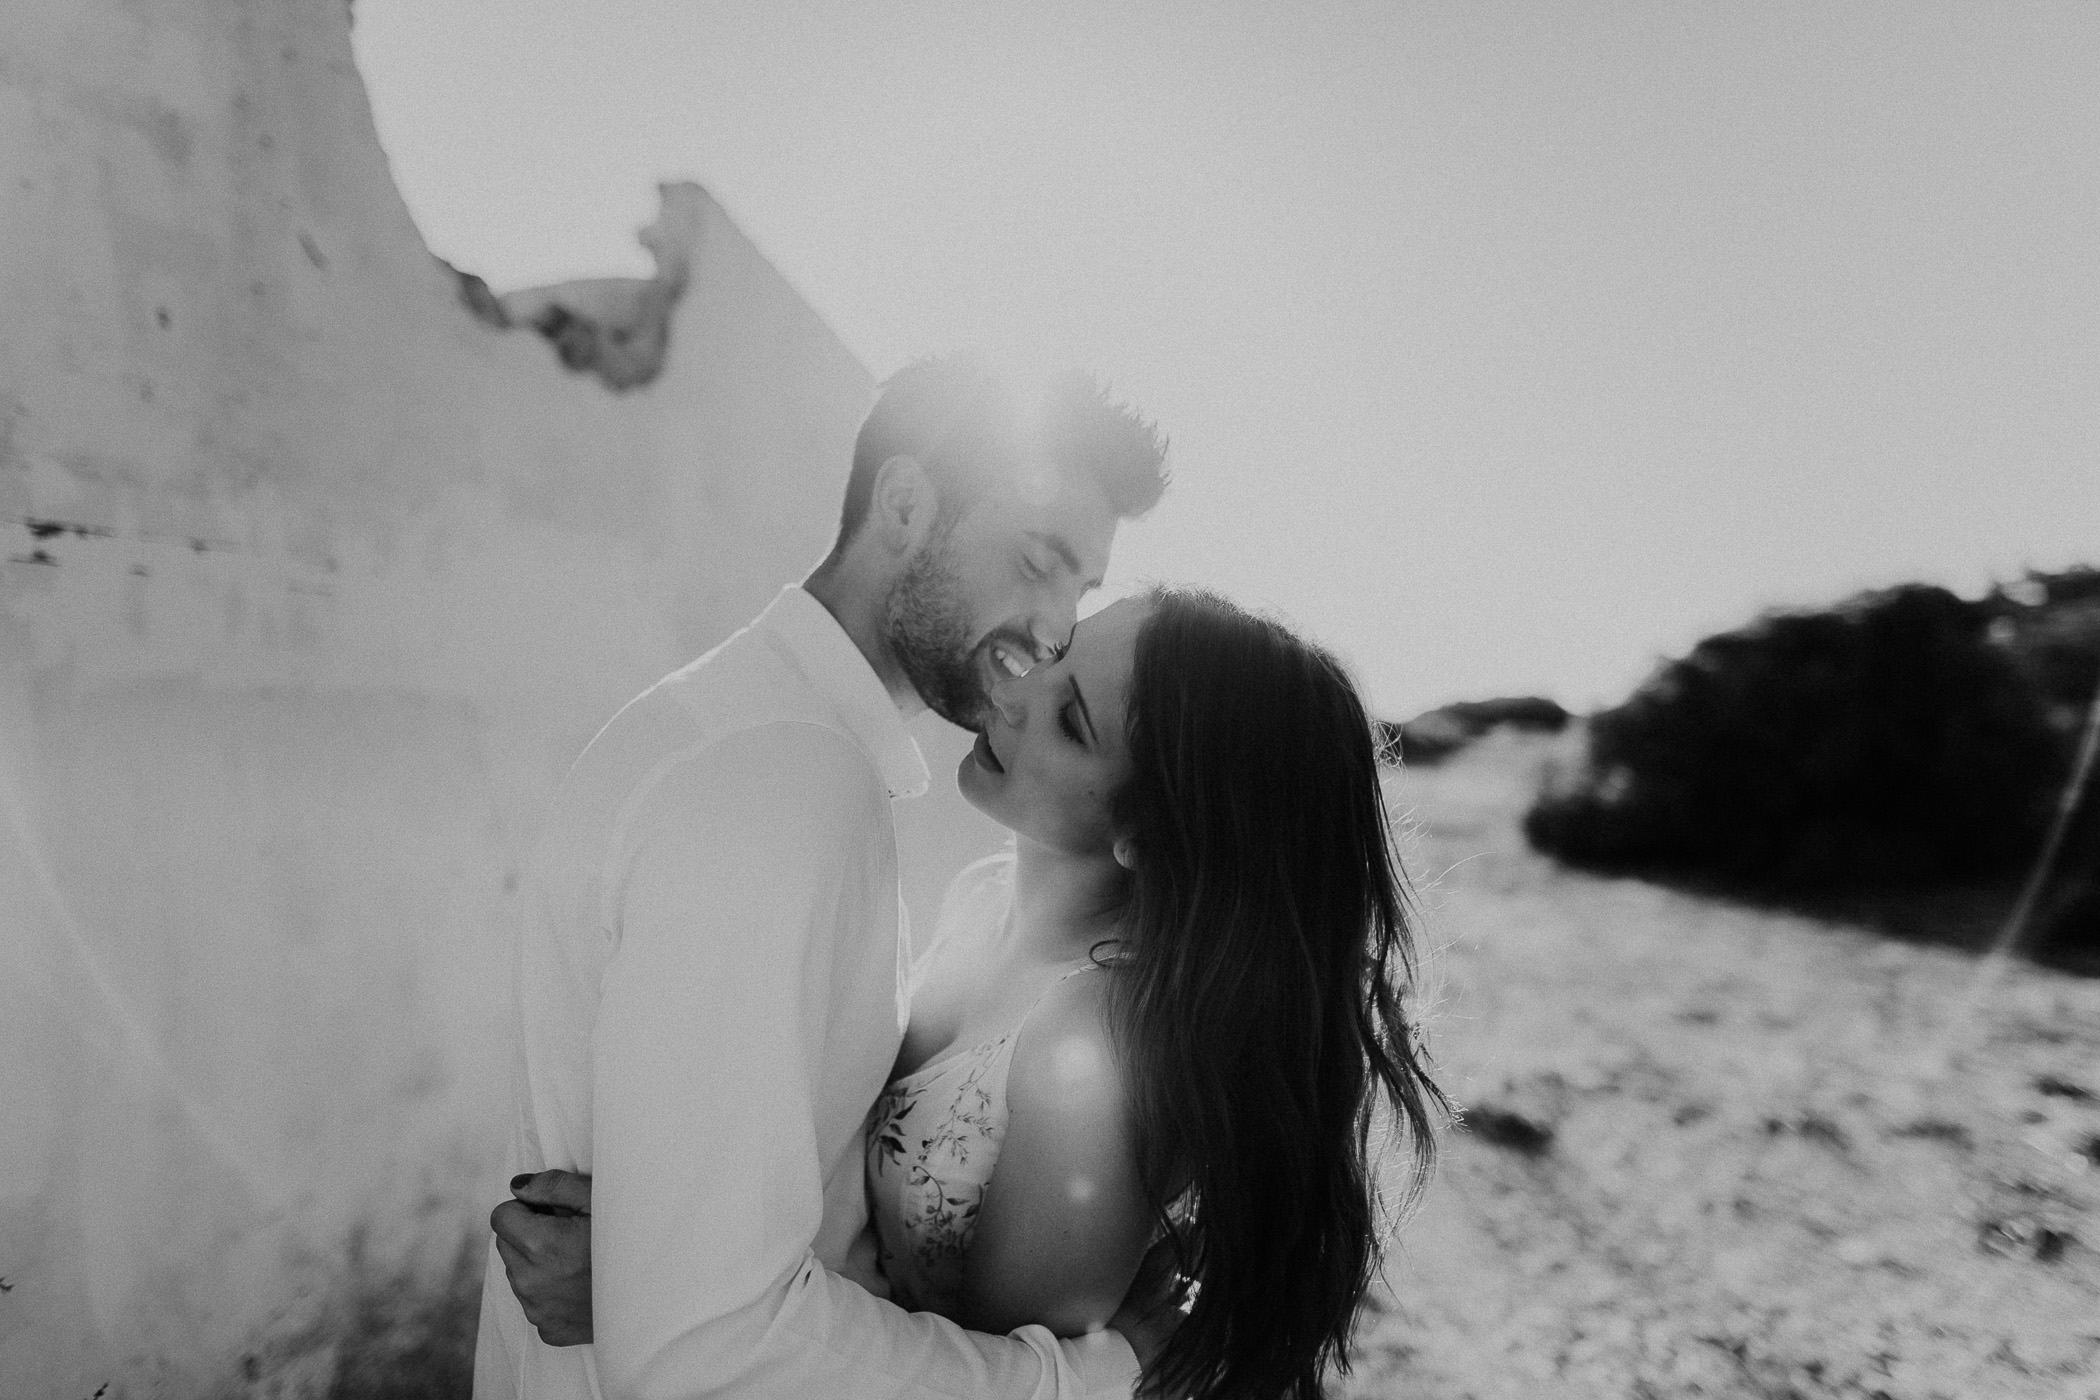 DanielaMarquardtPhotography_wedding_elopement_mallorca_spain_calapi_palma_lauraandtoni_367